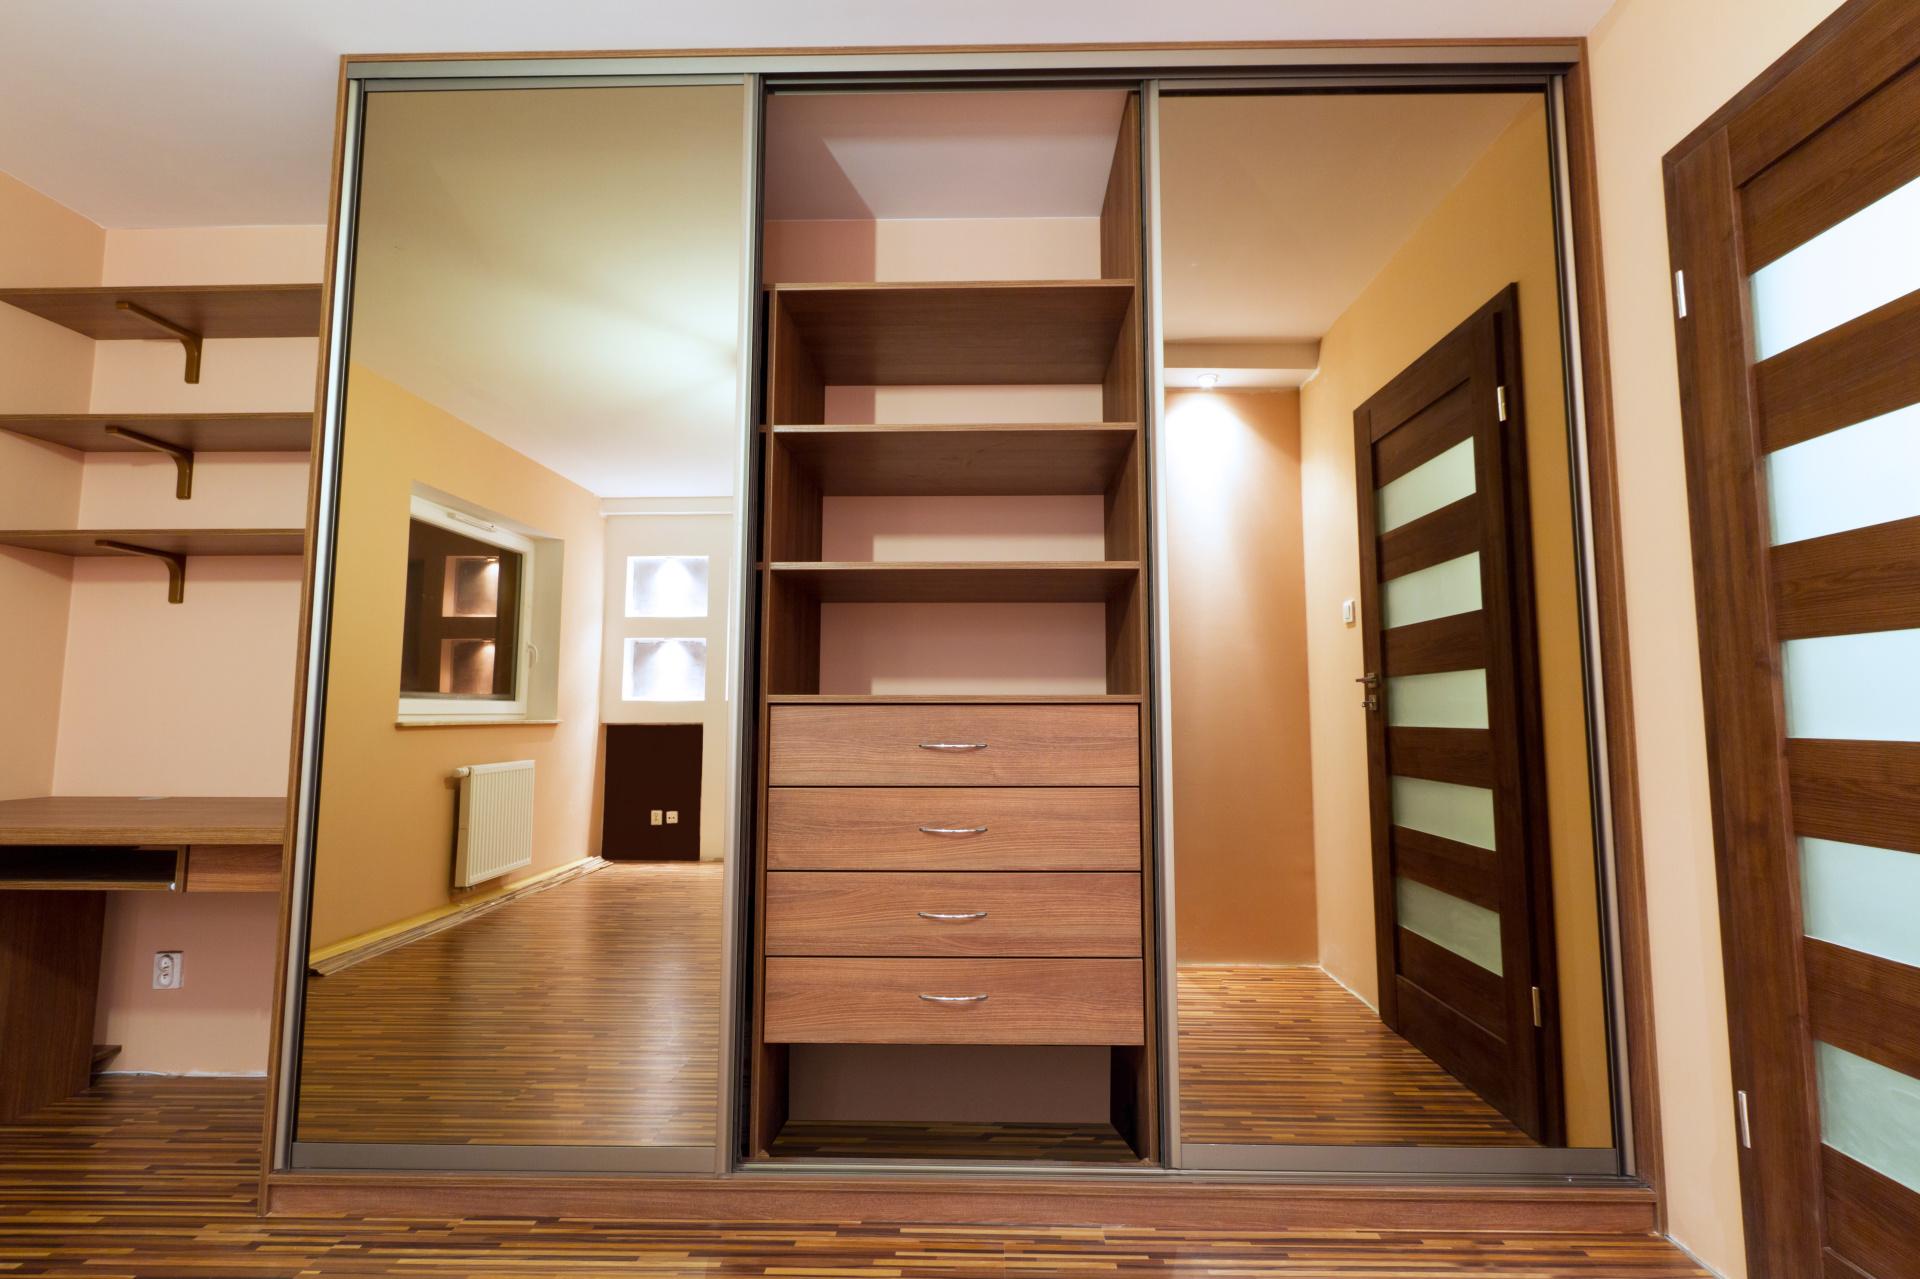 Modern apartment interior with huge sliding wardrobe Landsons.co.uk